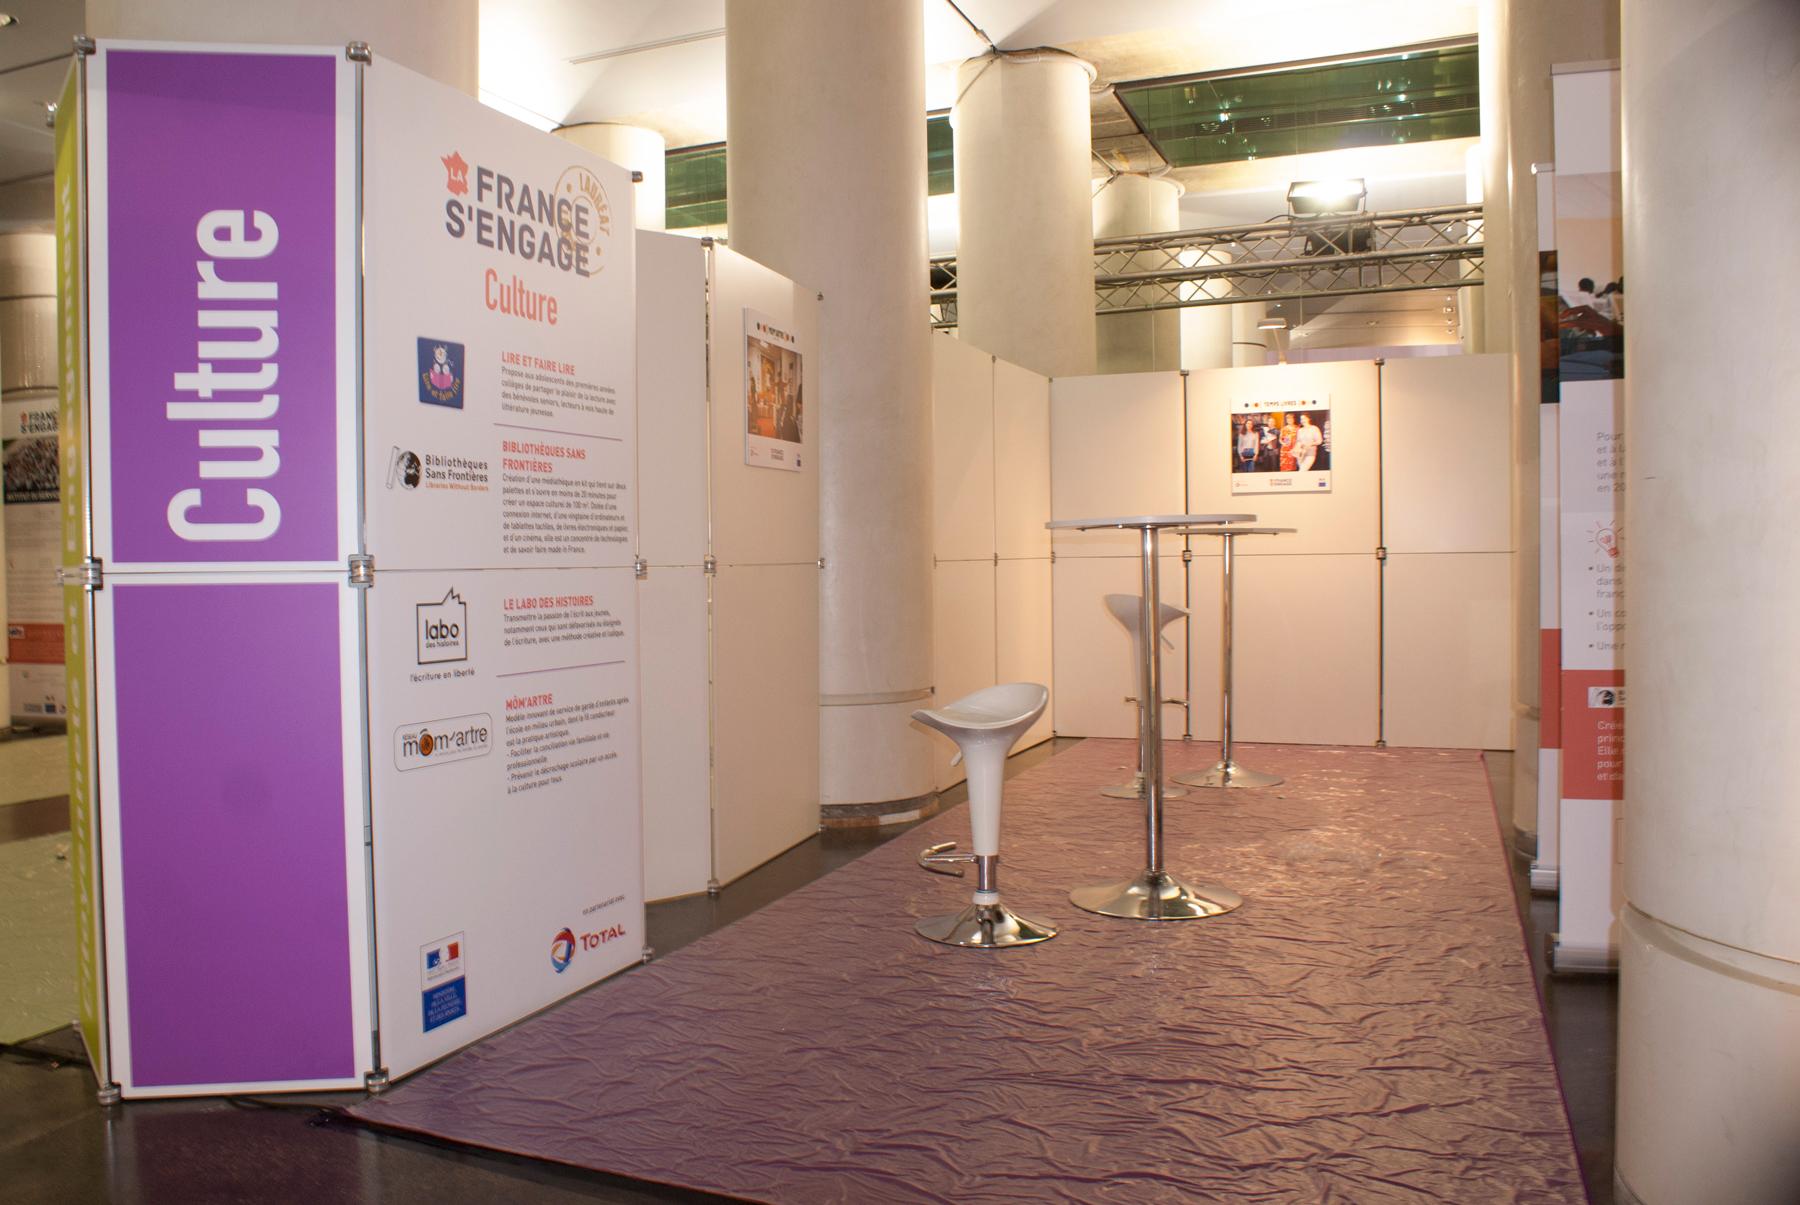 Installation-Generale-IMA-La-France-sengage-2015-(2)